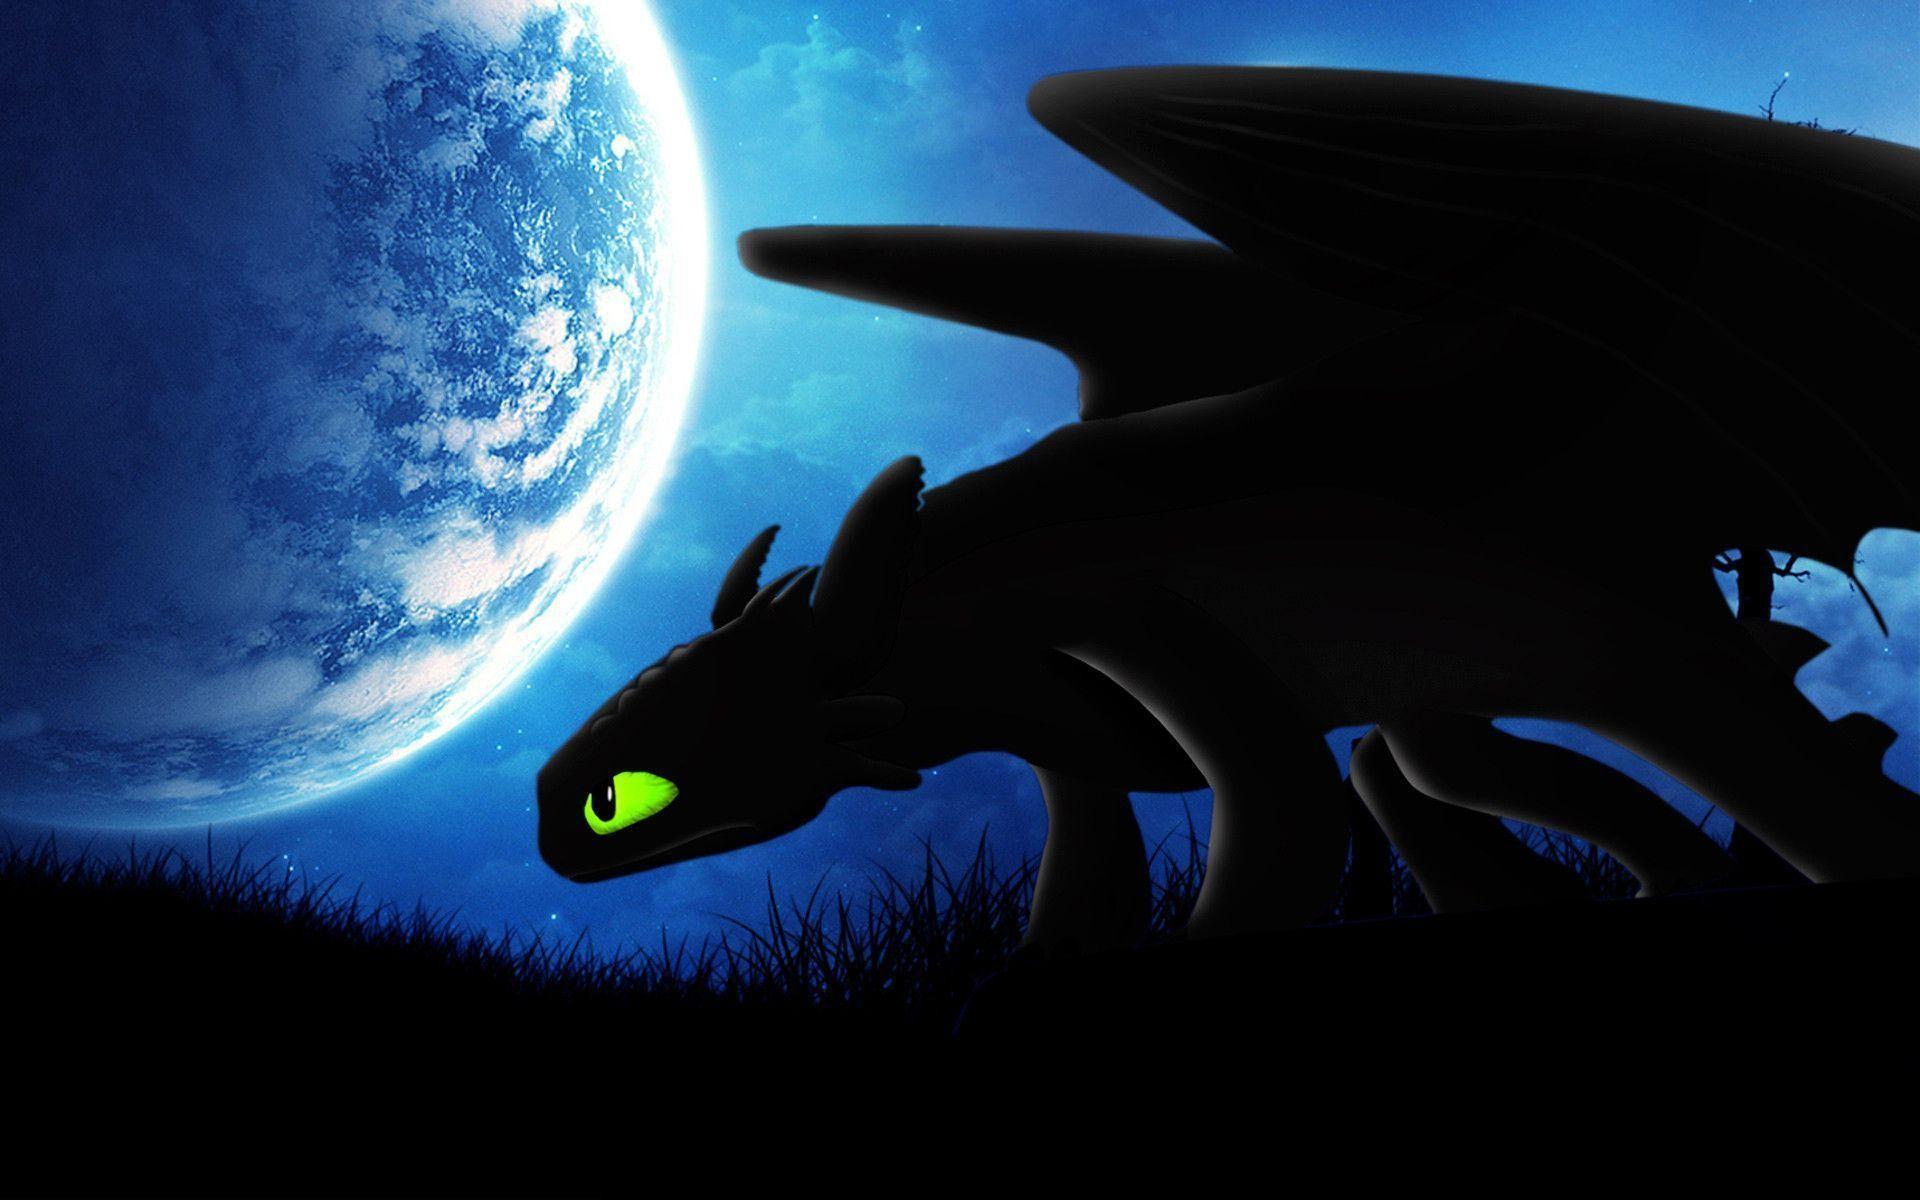 Best Wallpaper Night Dragon - 788942-cool-night-fury-wallpaper-1920x1200-high-resolution  HD.jpg